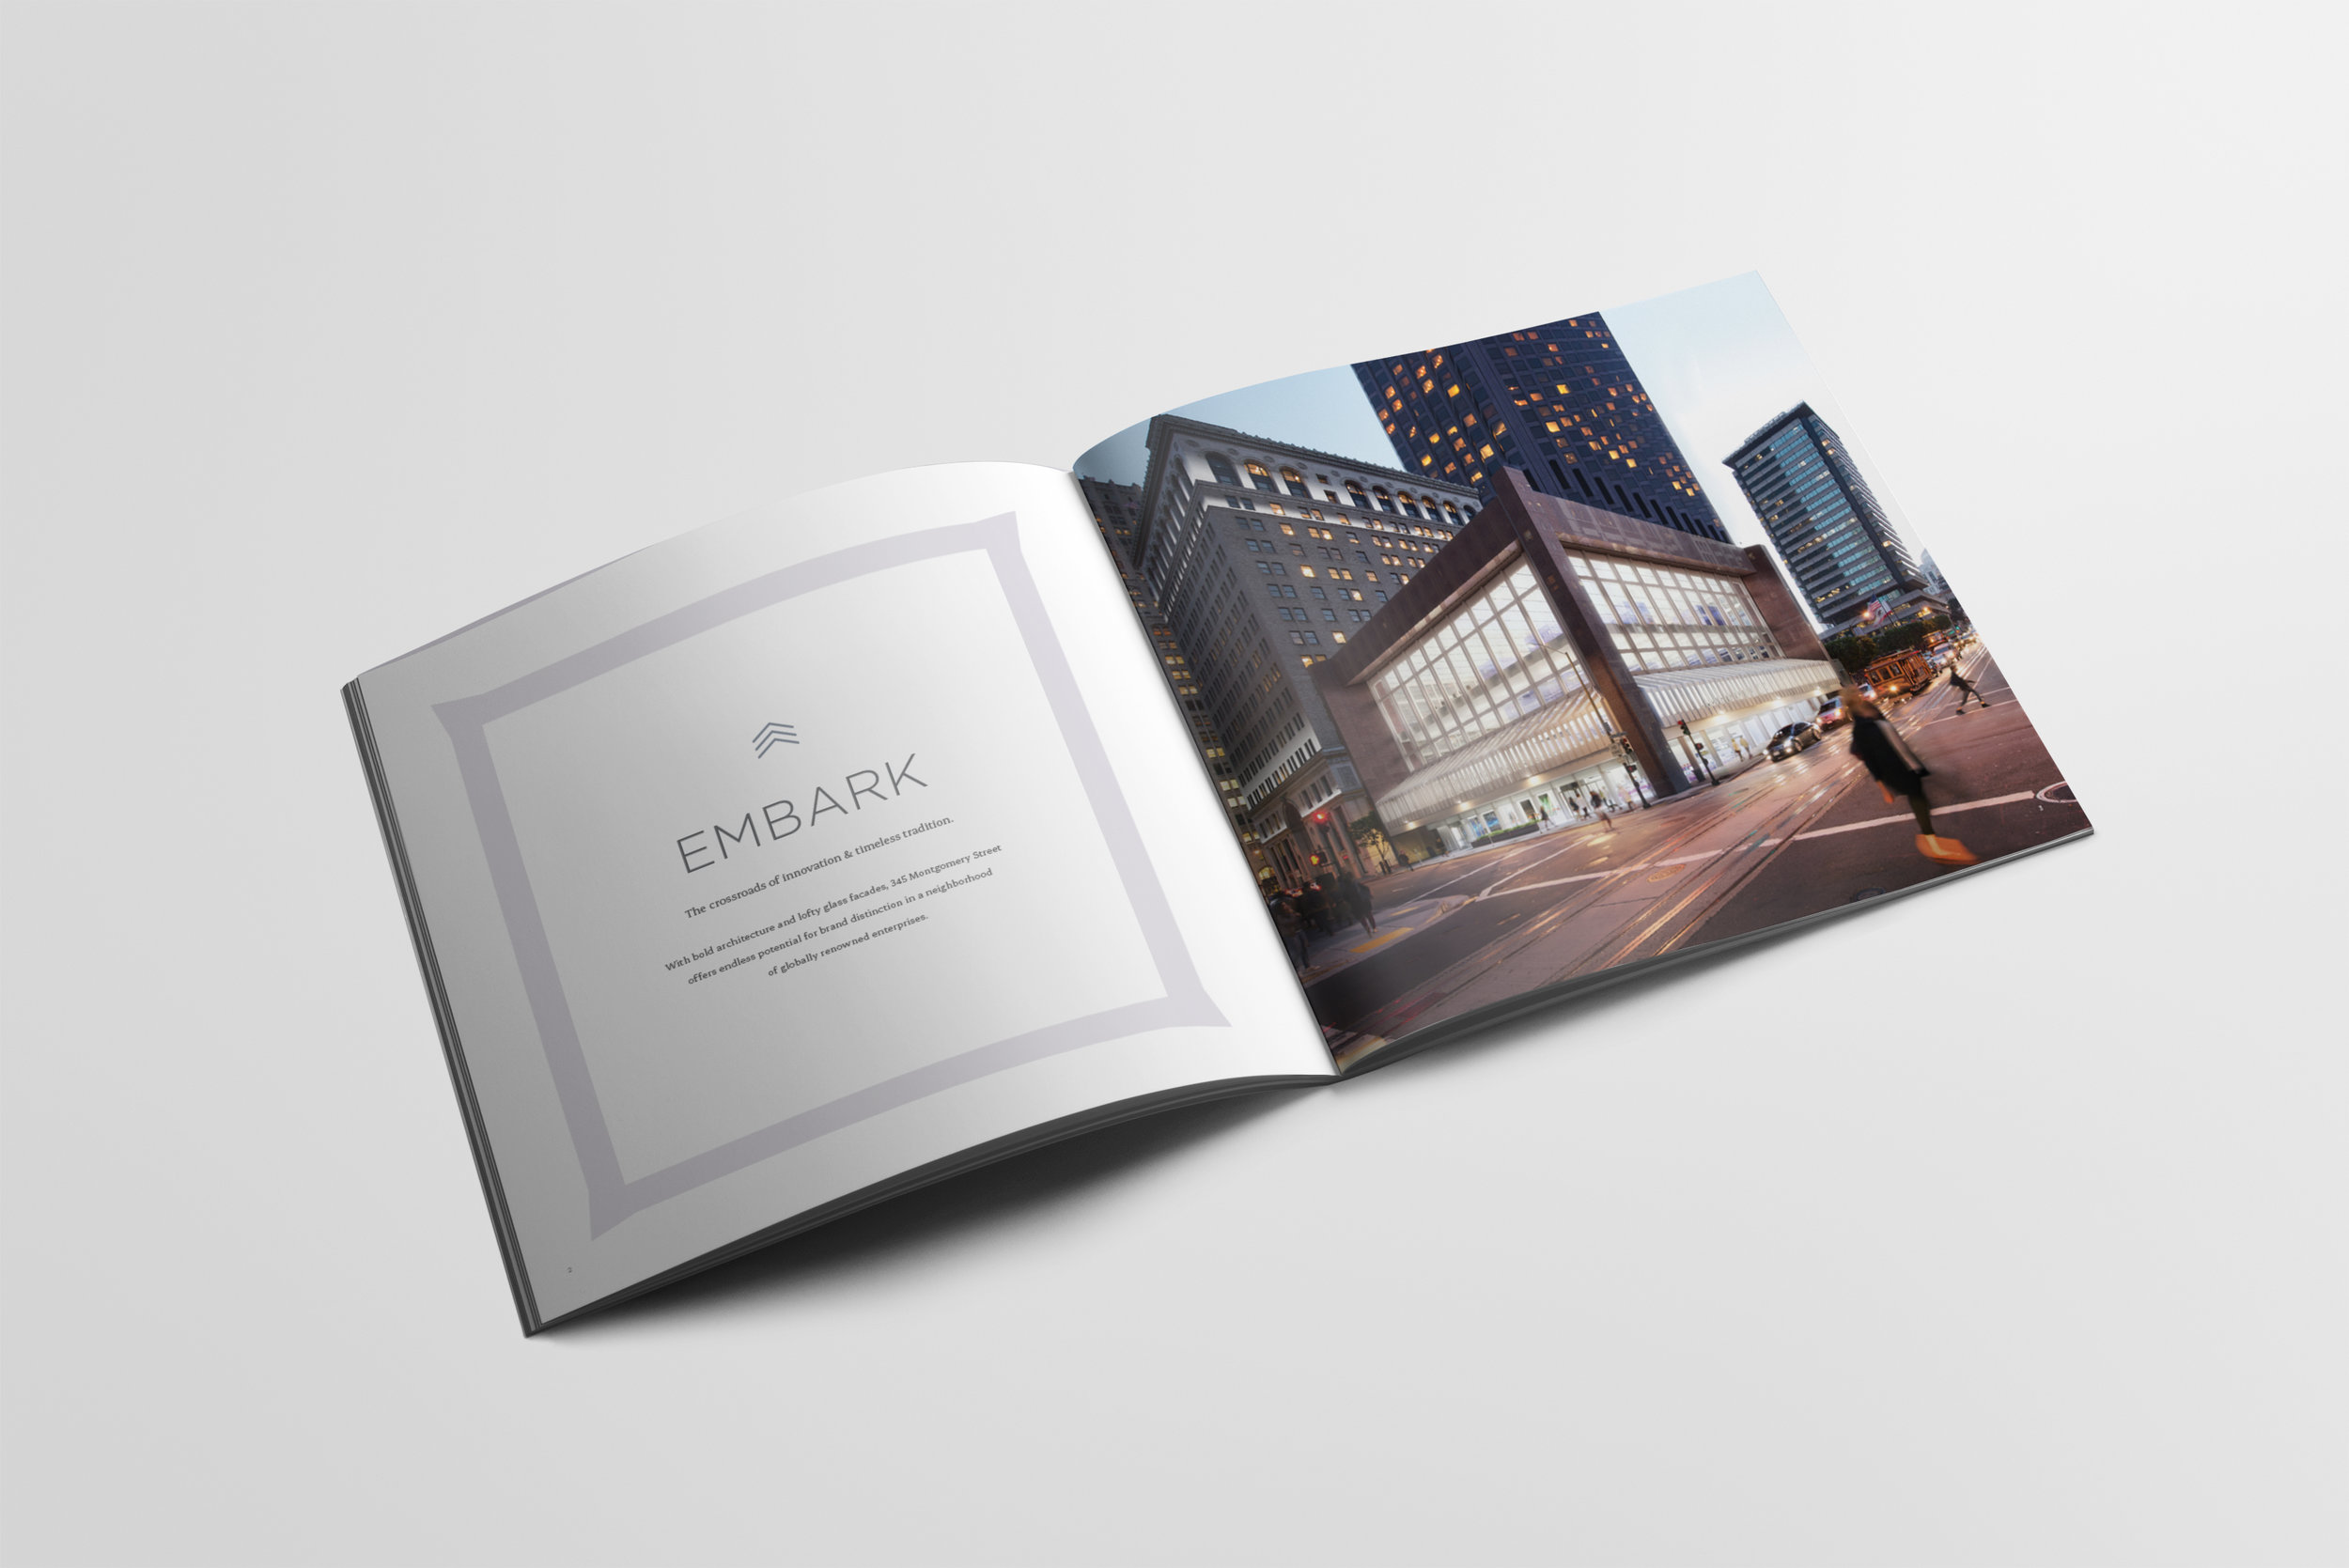 Vornado, 324 Montgomery, print book design